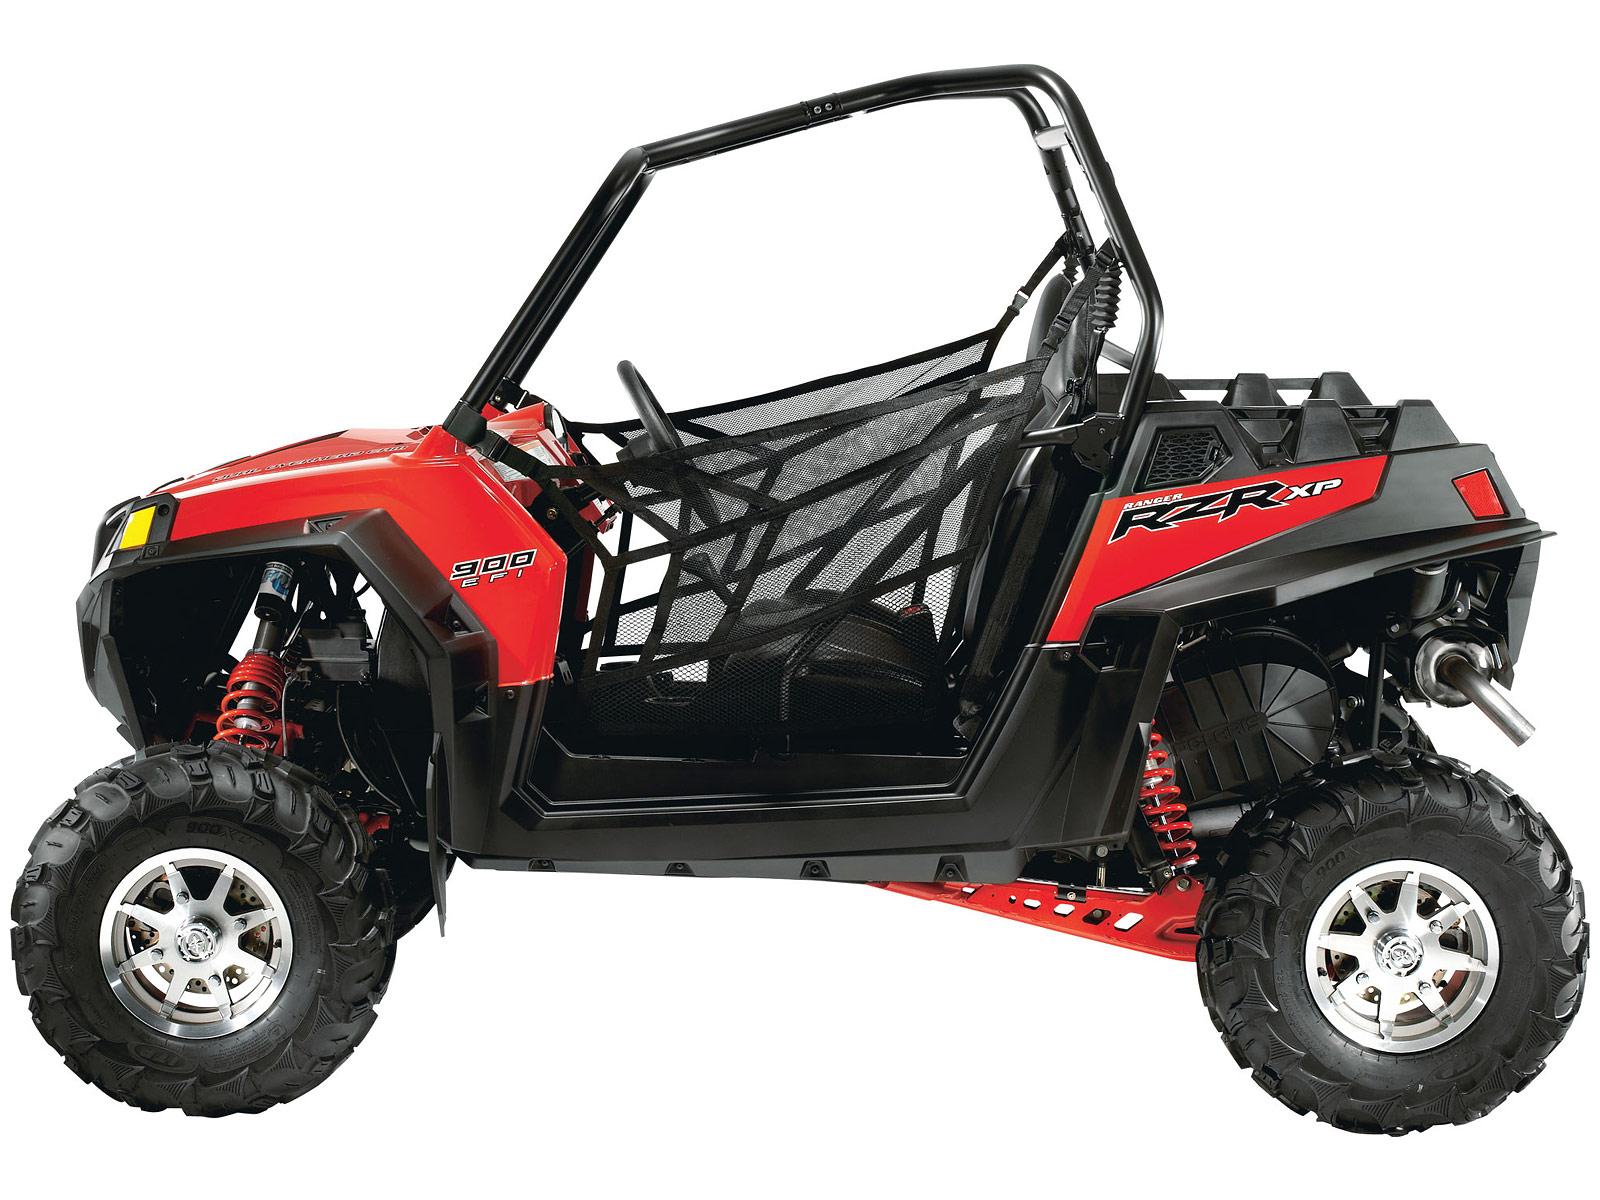 Insurance information | 2012 Polaris Ranger RZR XP 900